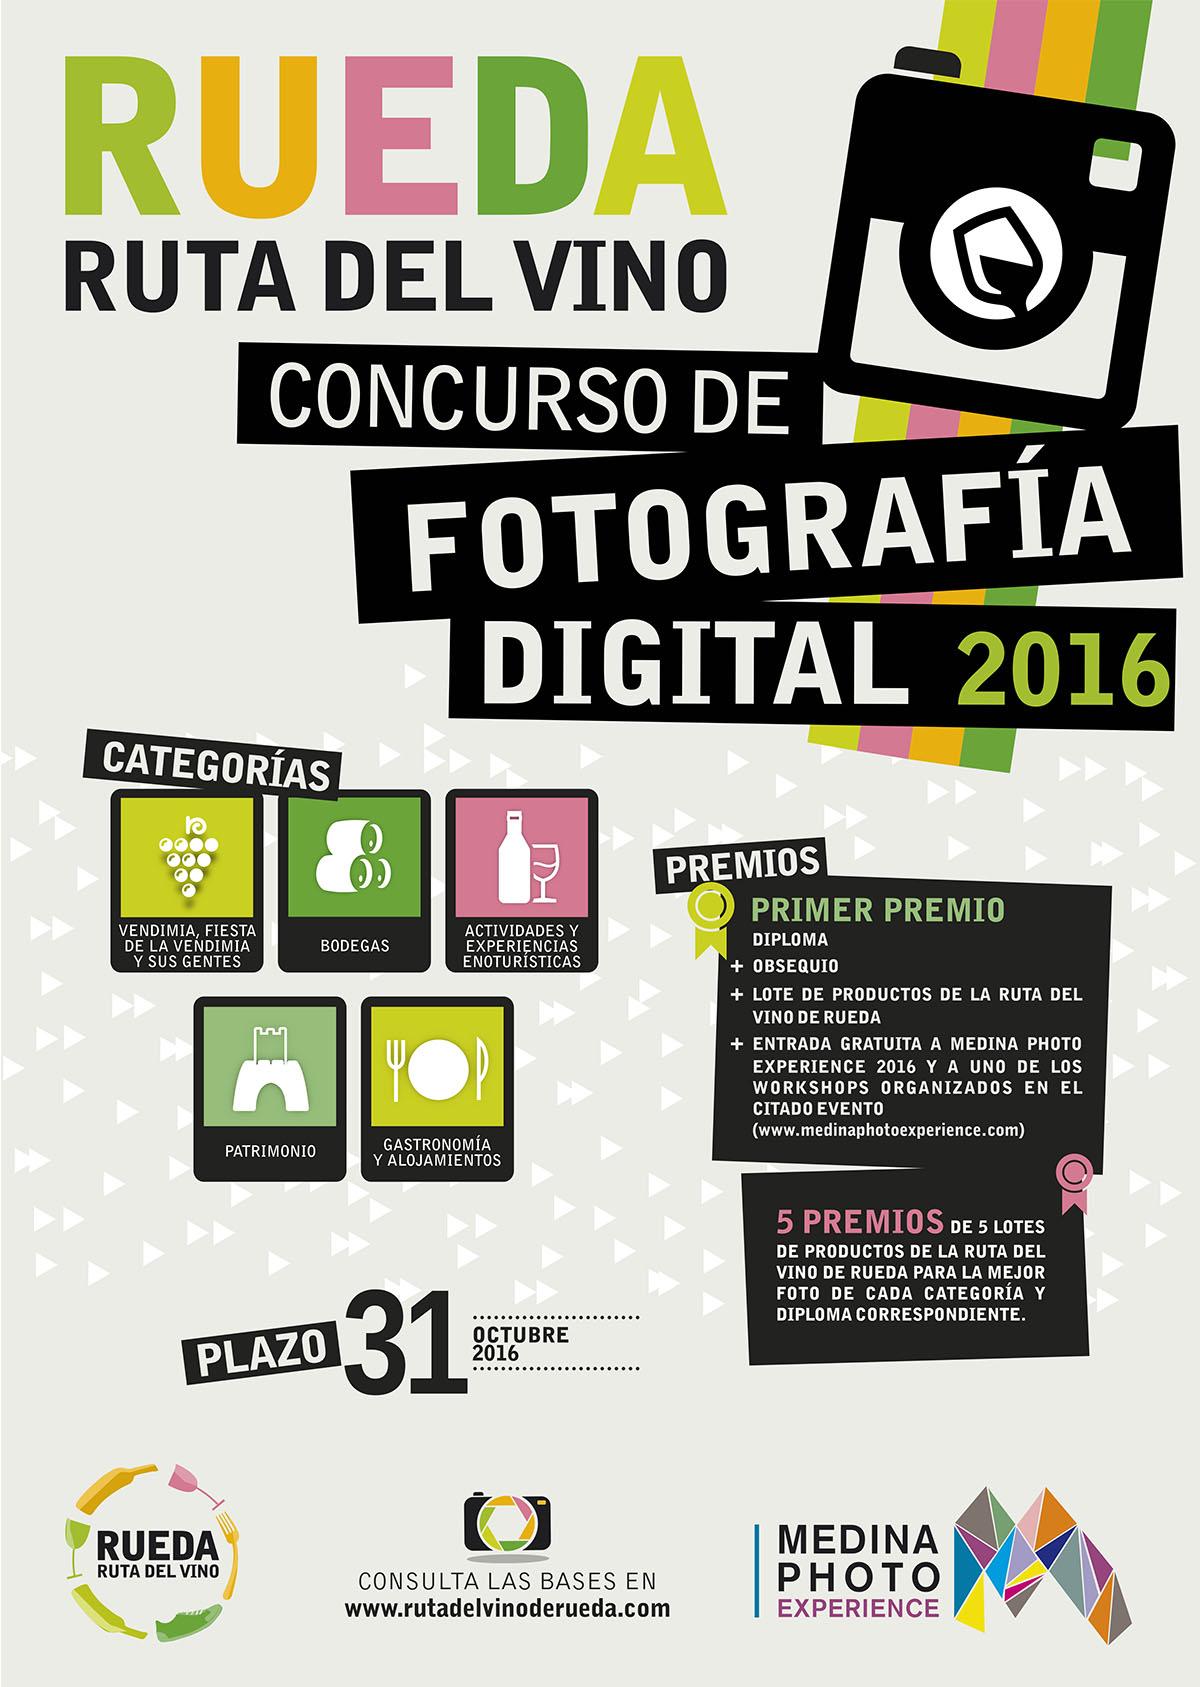 concurso foto ruta rueda cartel.cdr